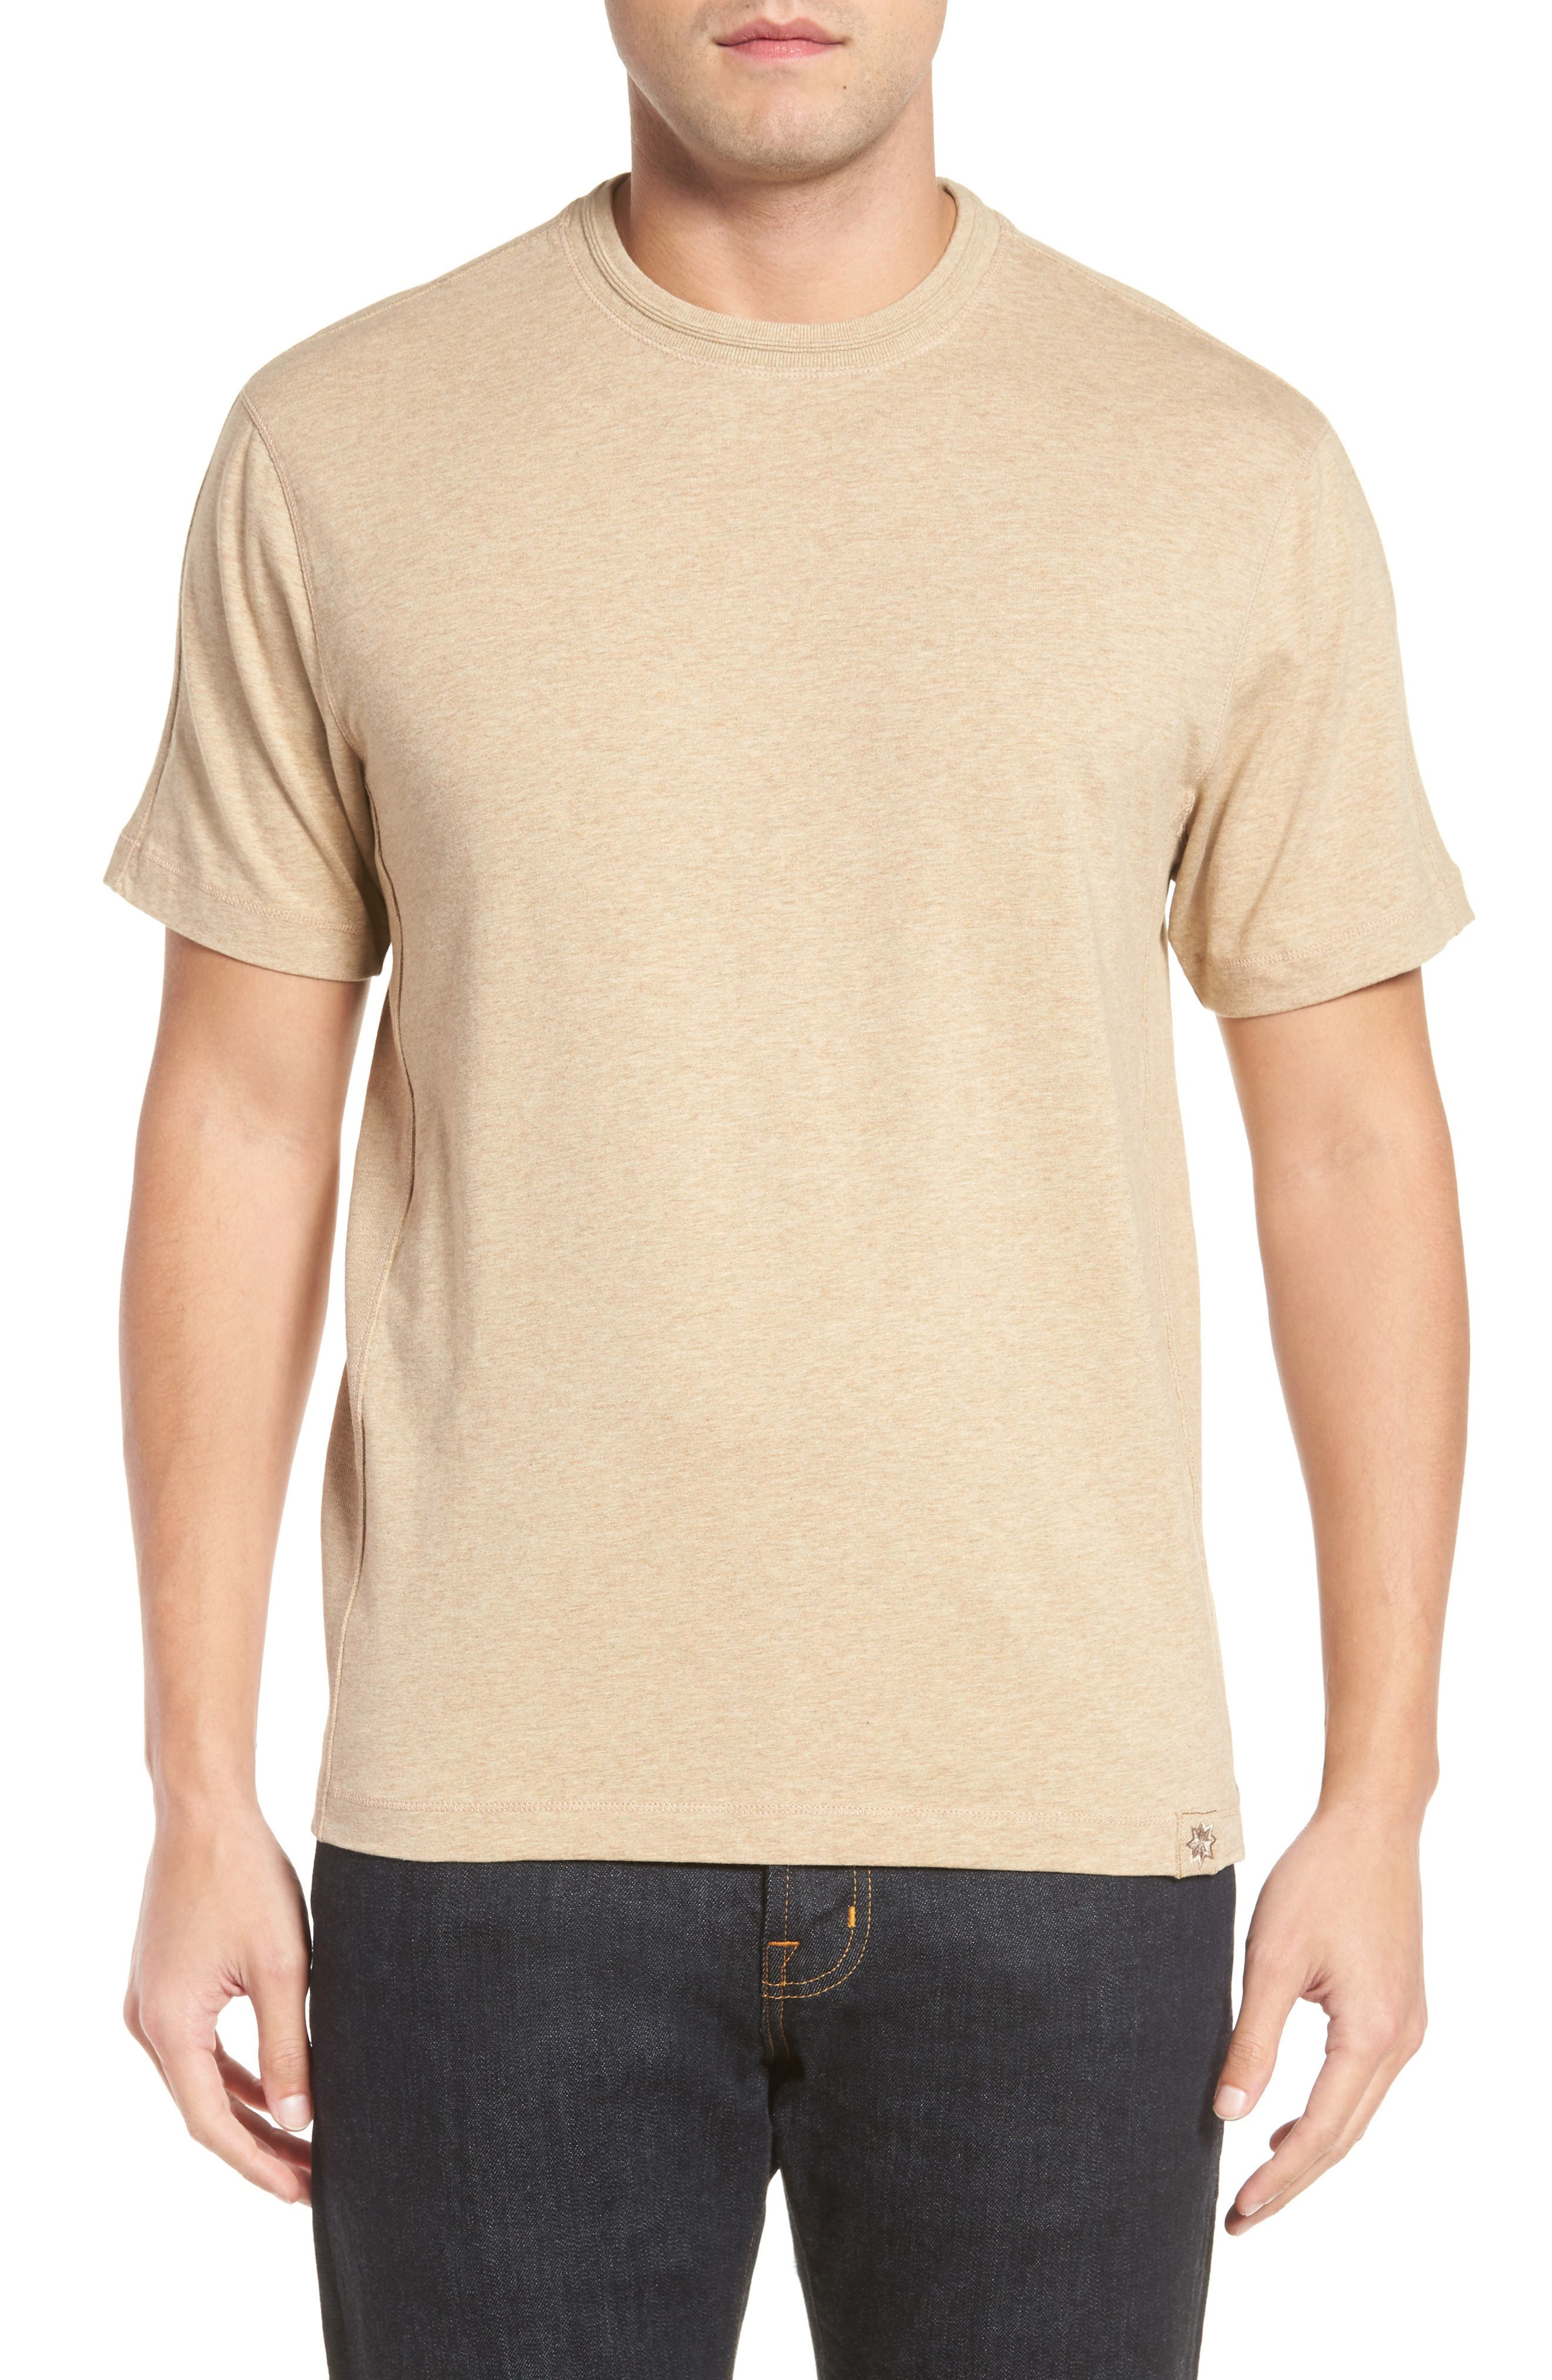 Alternate Image 1 Selected - Thaddeus Steve Stretch Jersey T-Shirt